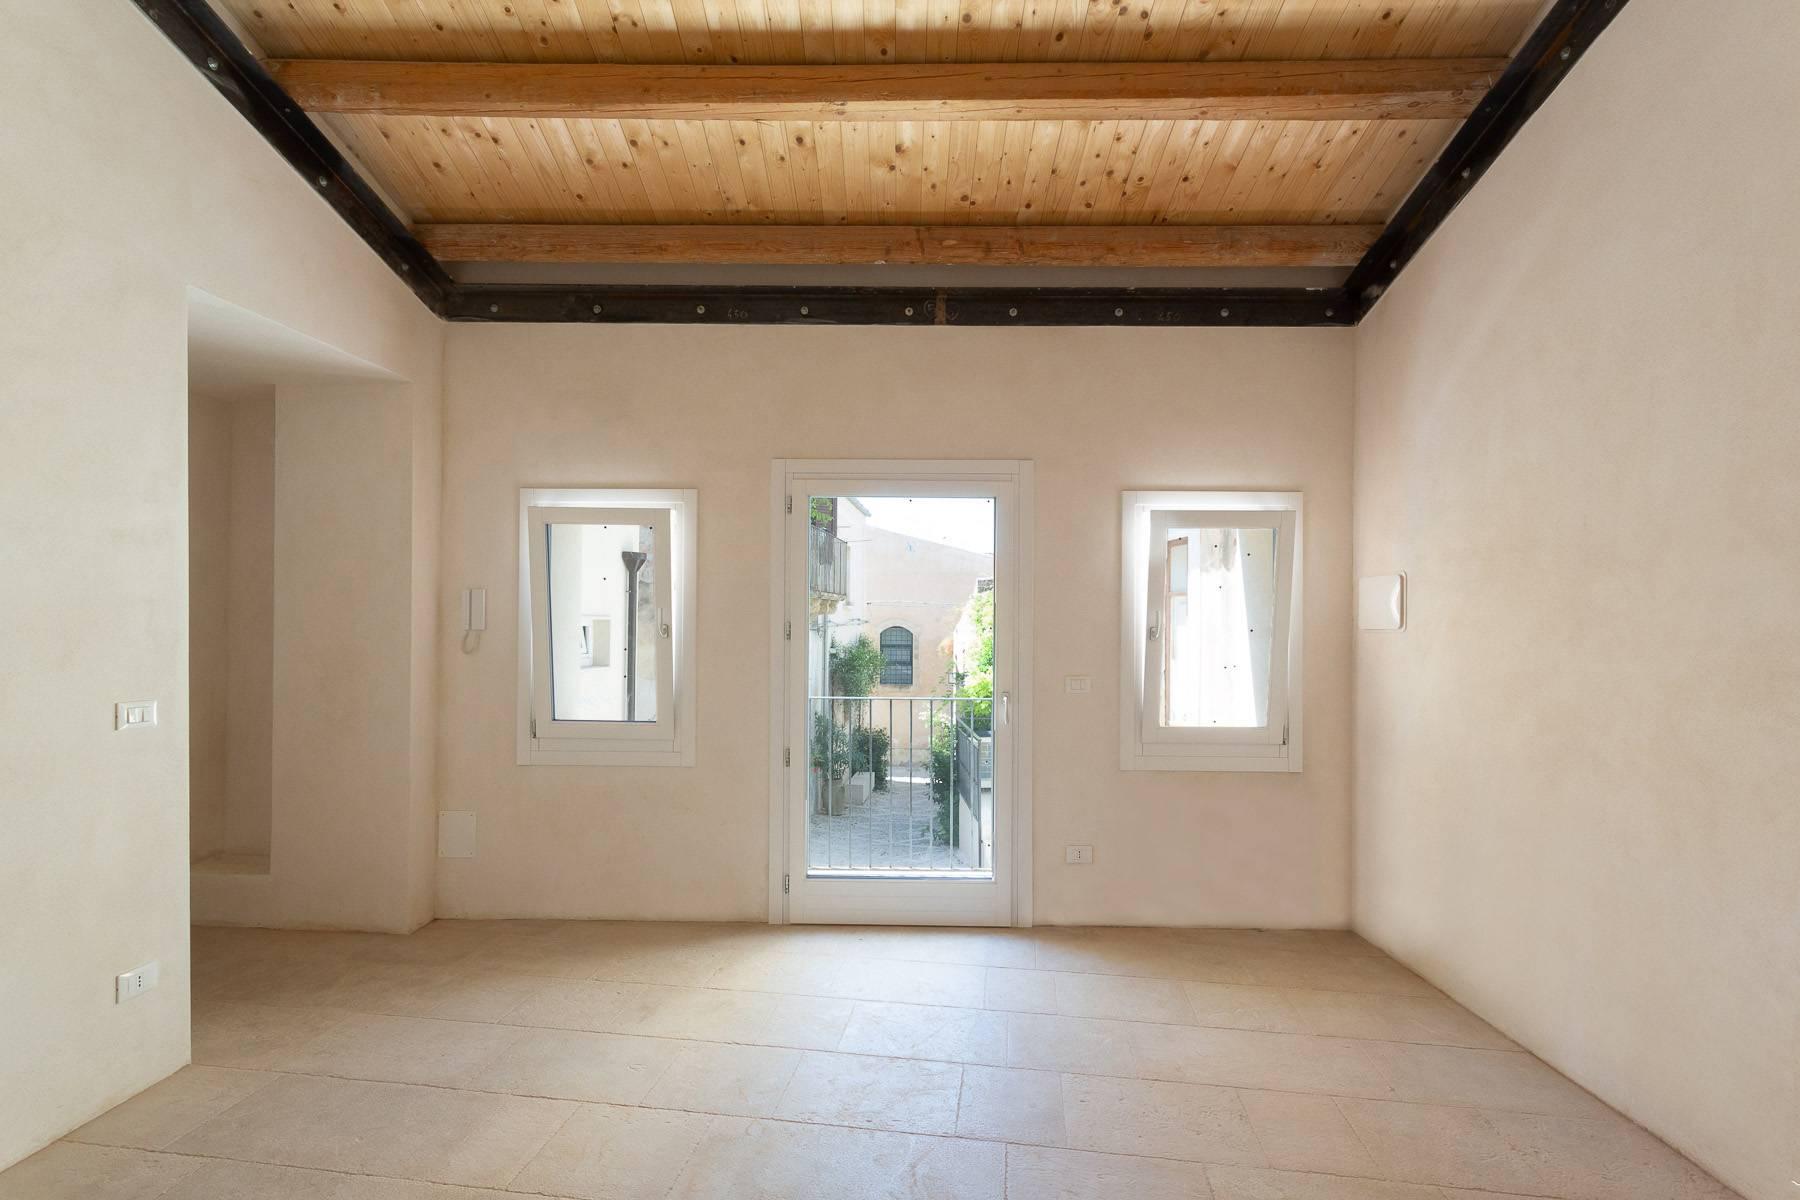 Casa indipendente in Vendita a Noto: 2 locali, 74 mq